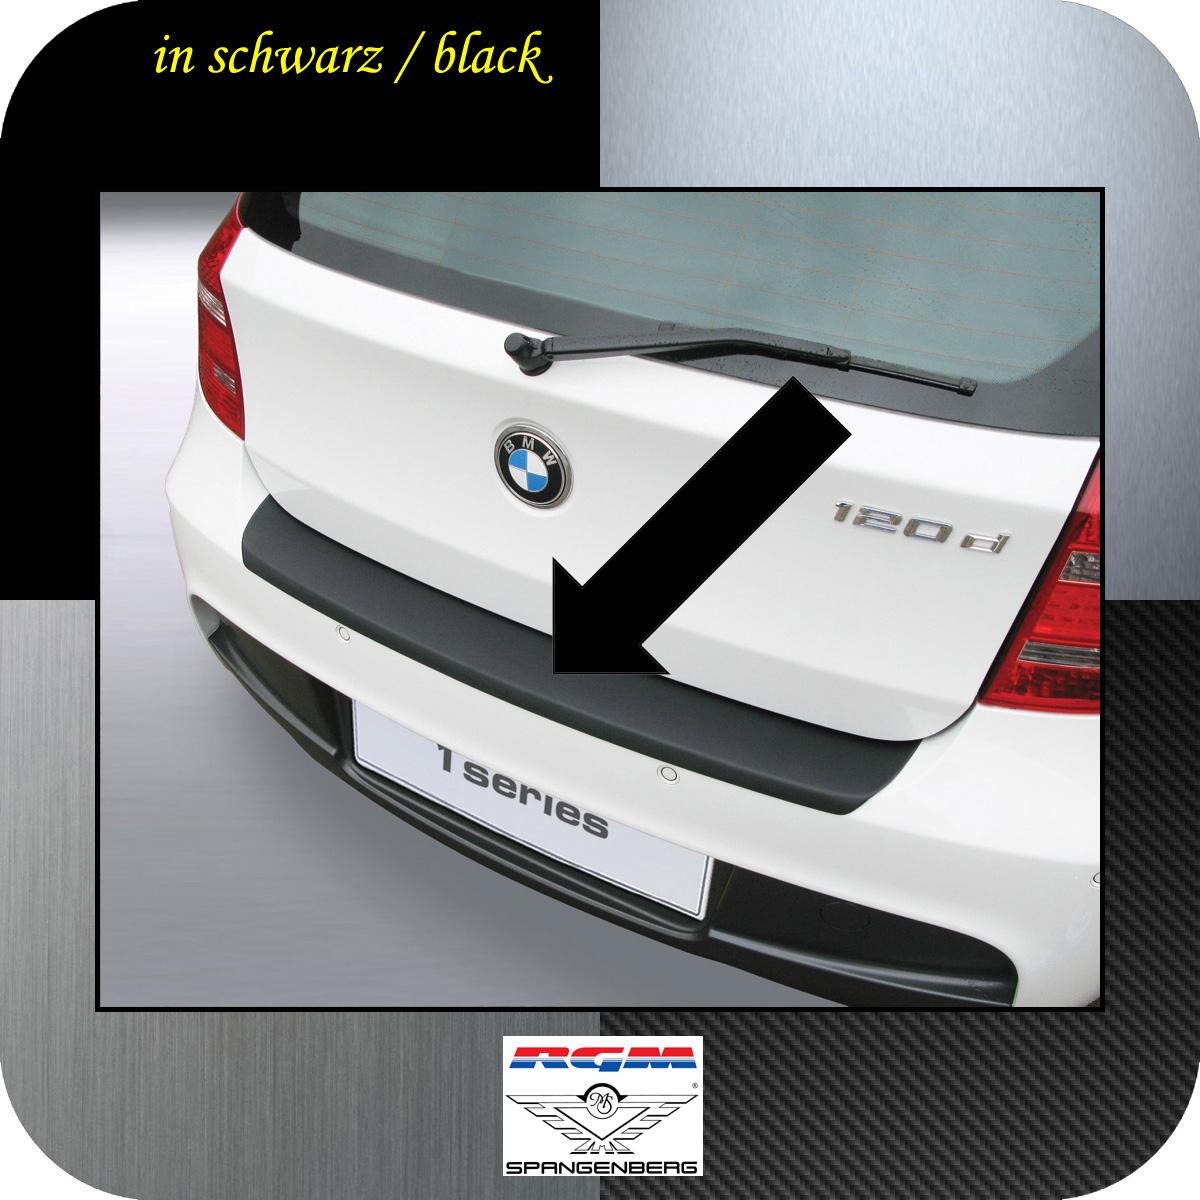 Ladekantenschutz schwarz BMW 1er E81 E87 M-Style ab facelift 2007-12 3500457